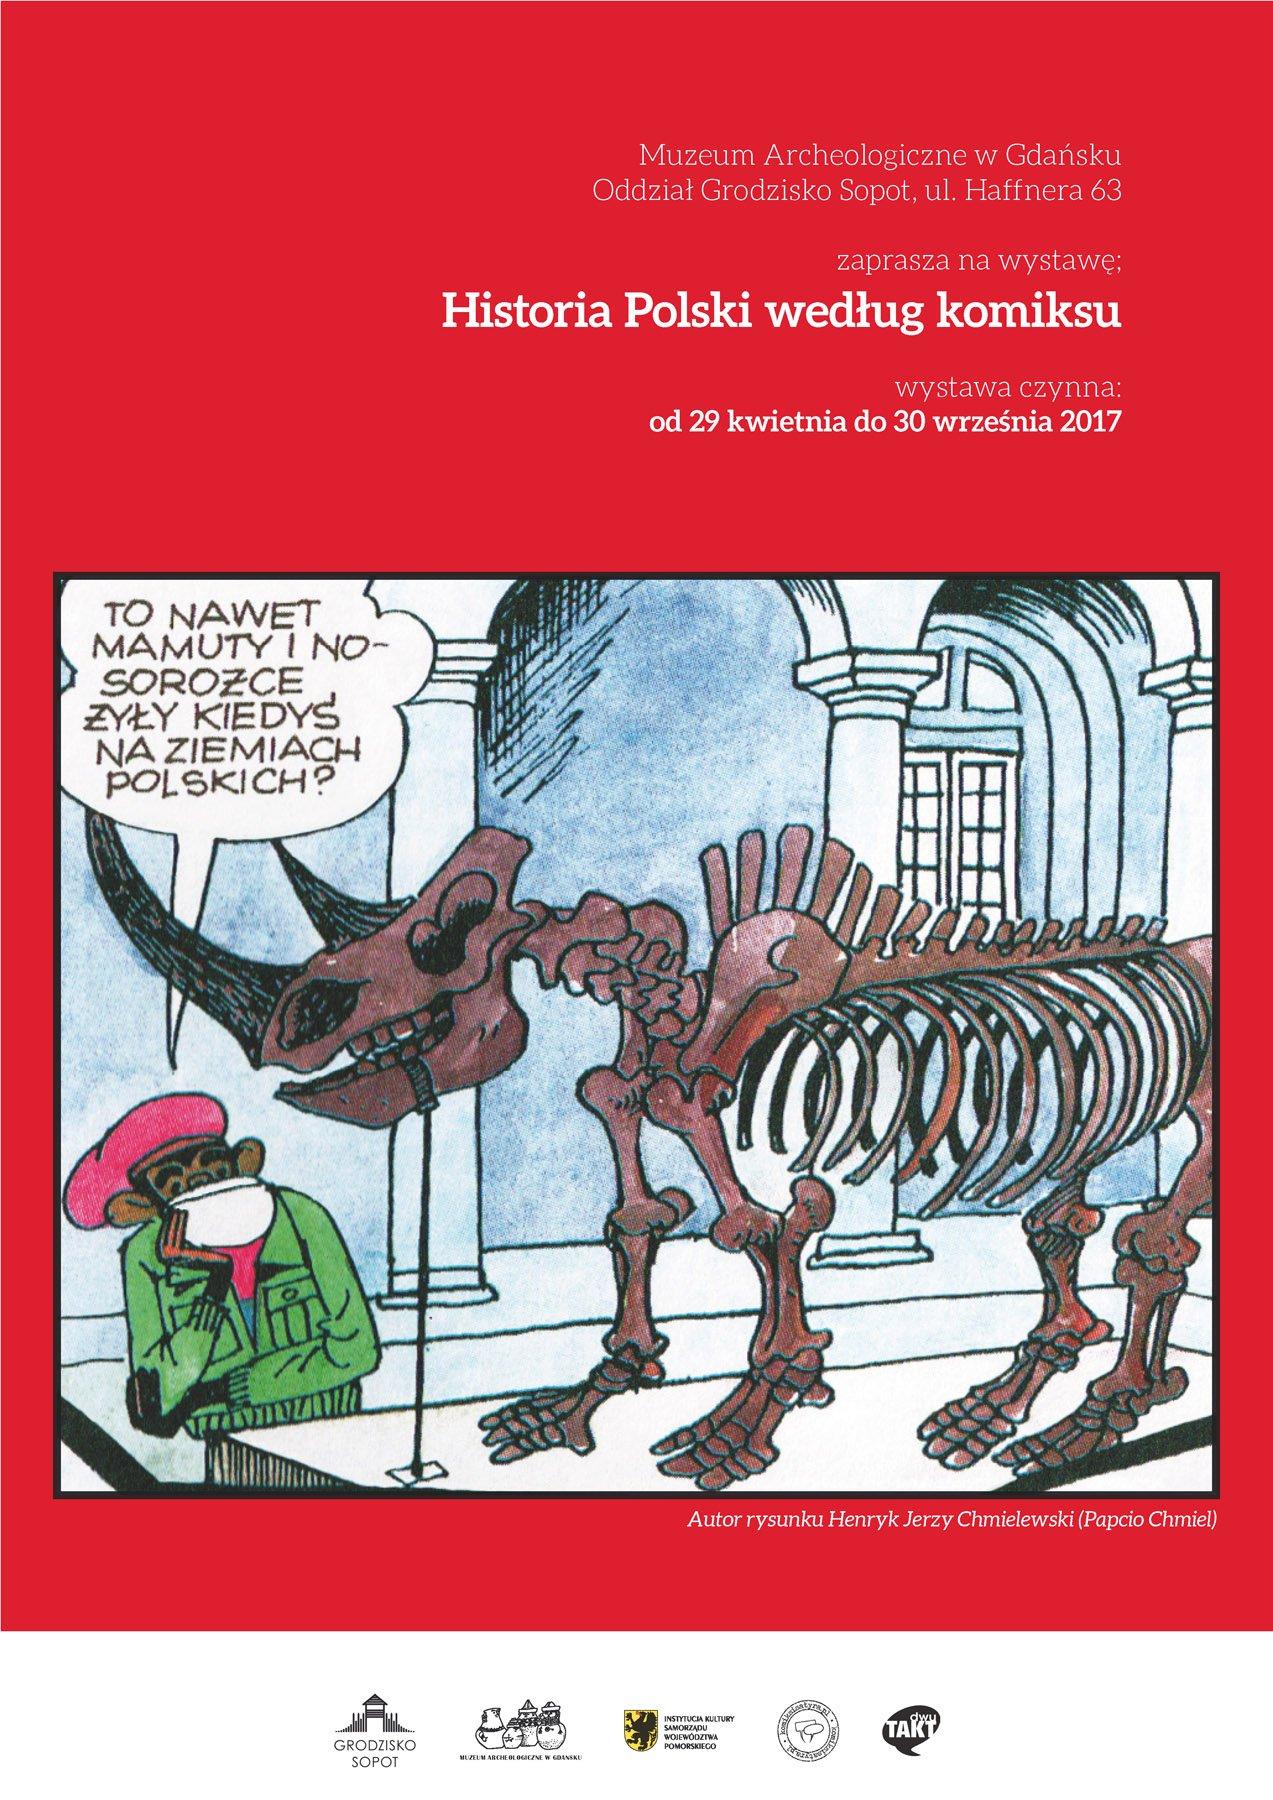 historia polski według komiksu